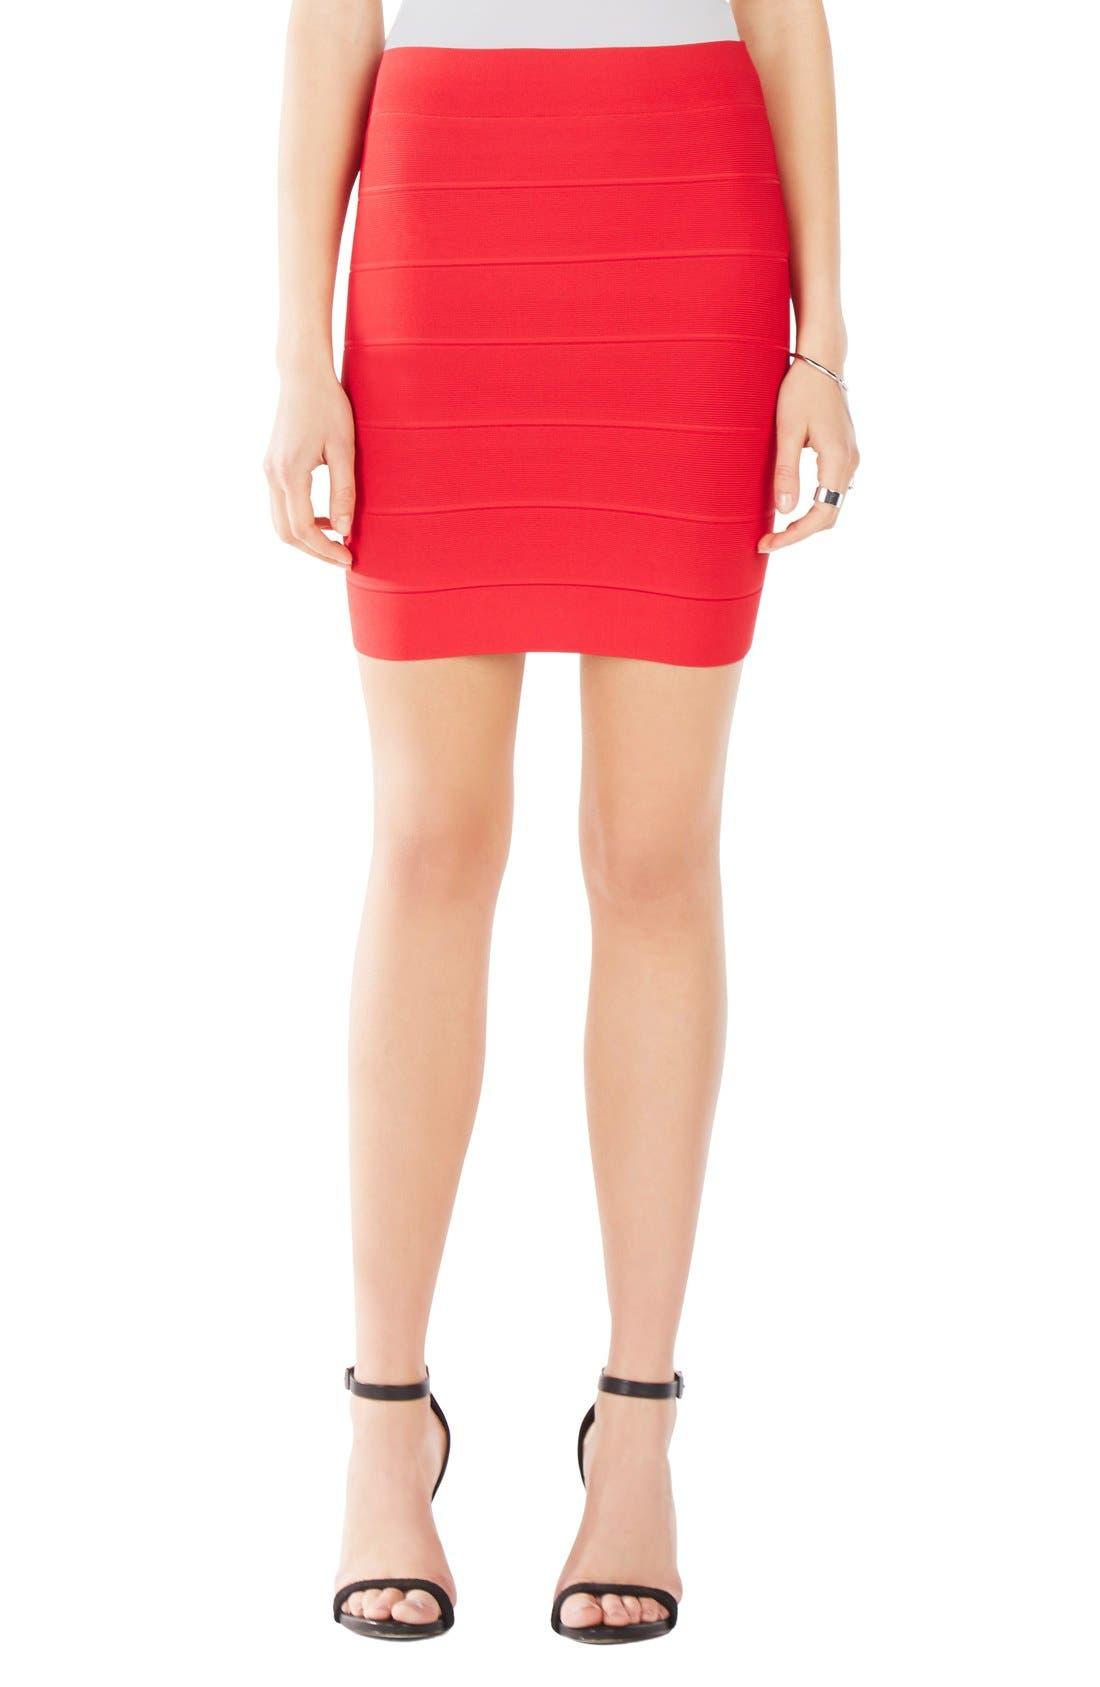 Main Image - BCBGMAXAZRIA 'Simone' Bandage Knit Pencil Skirt